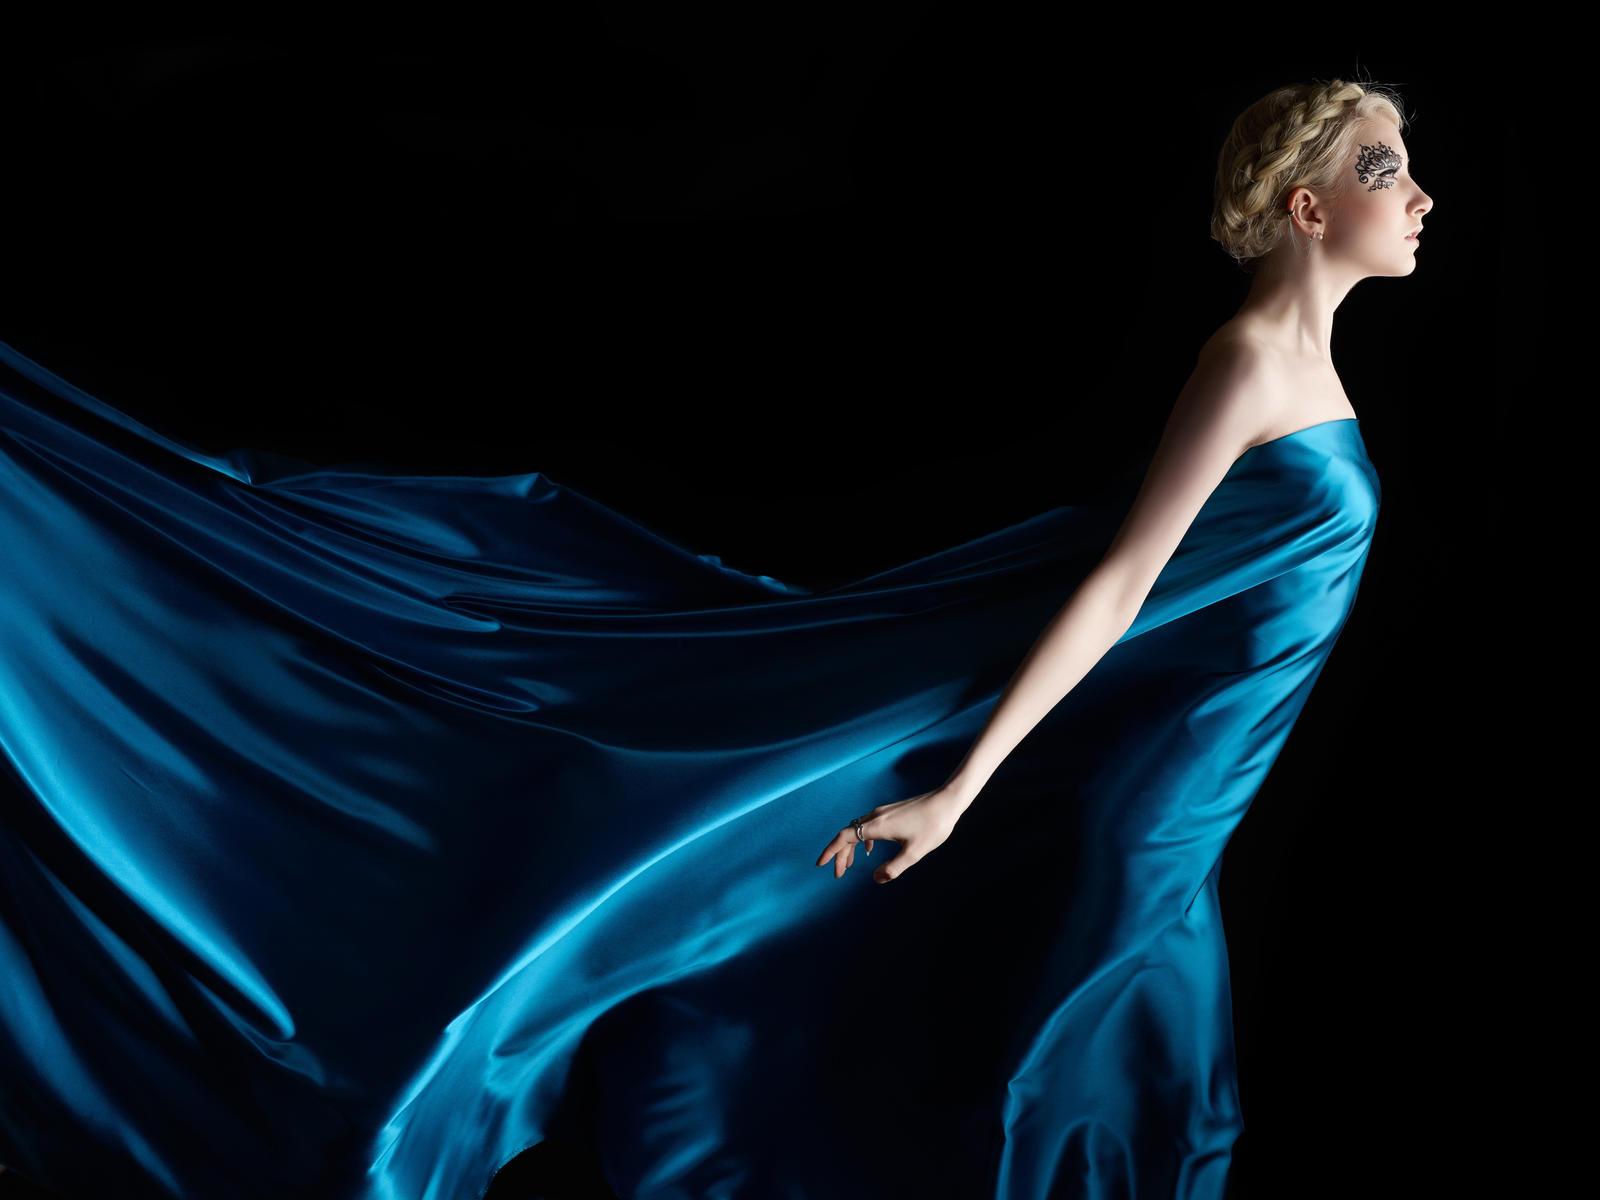 Blue Silk Stock - Concept by Faestock